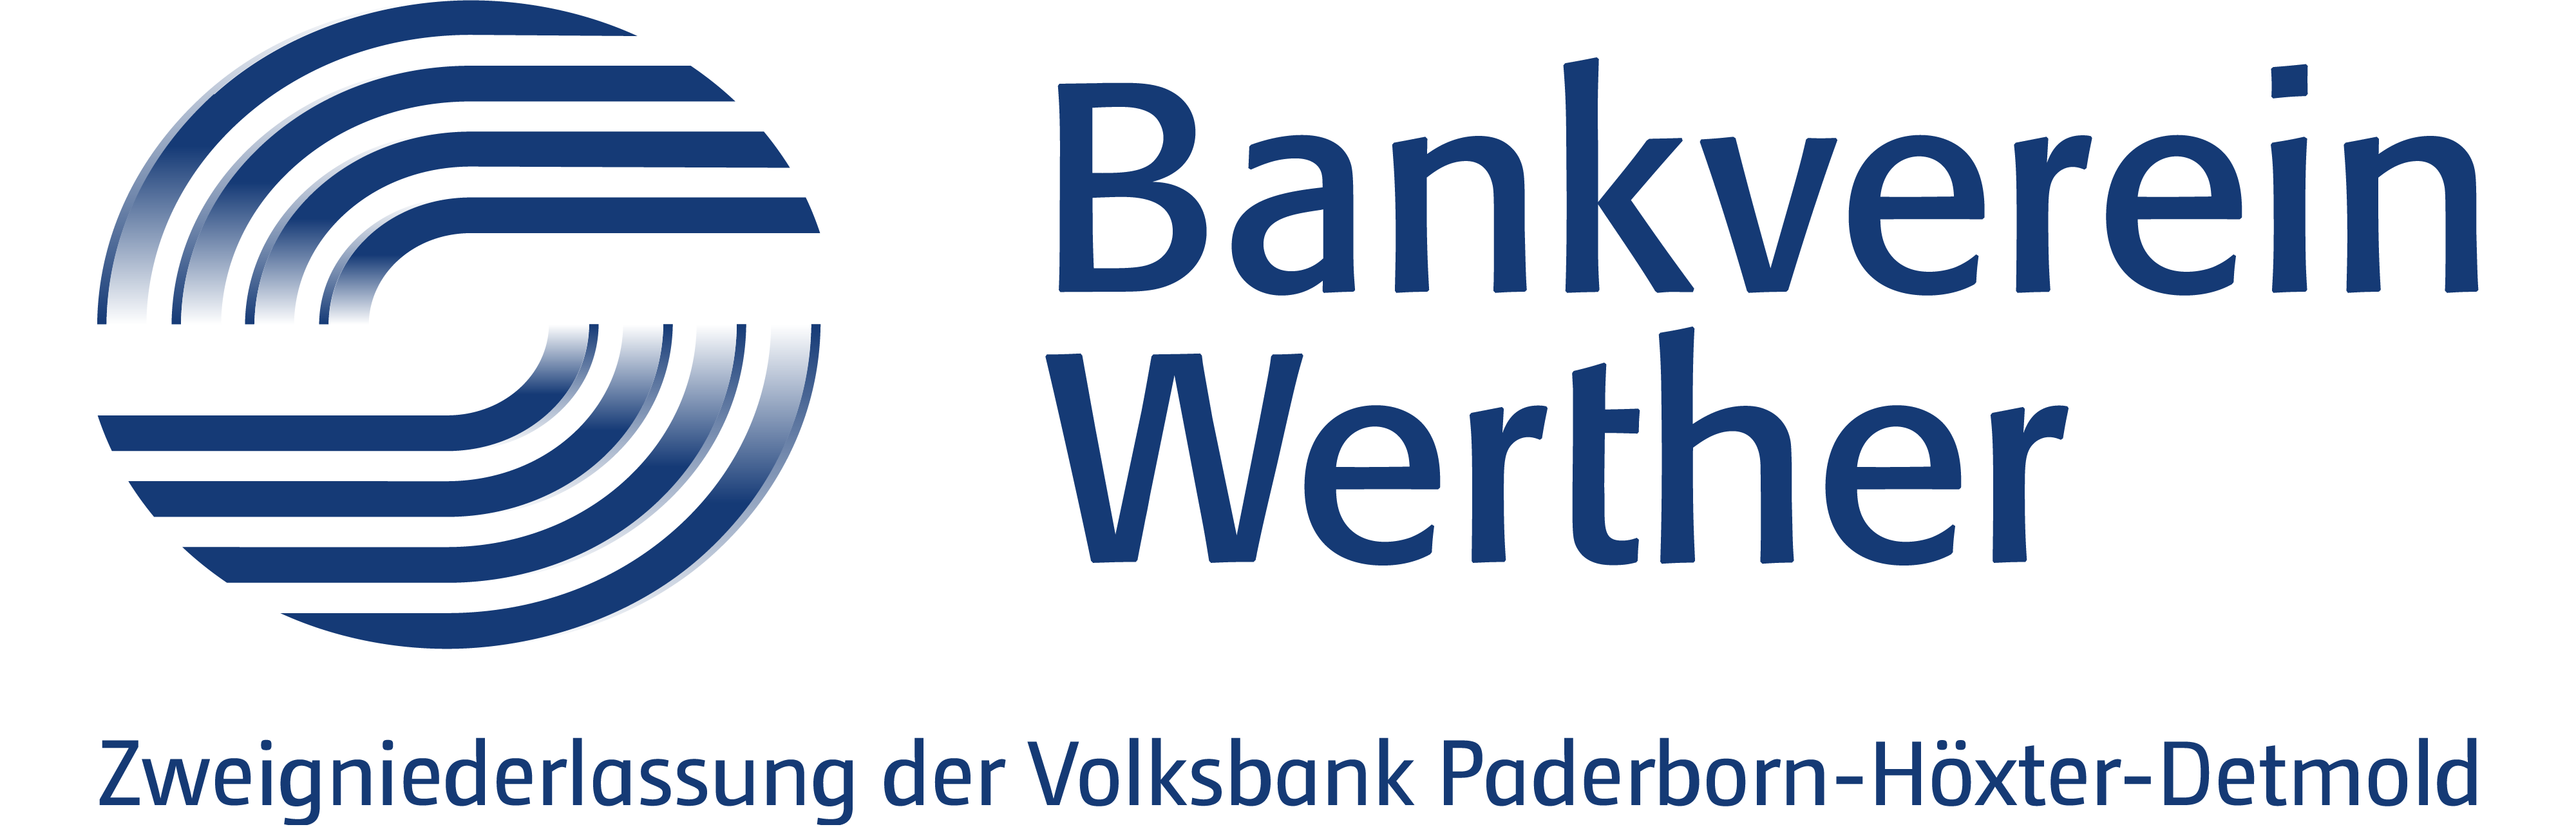 neues Logo nach Integration